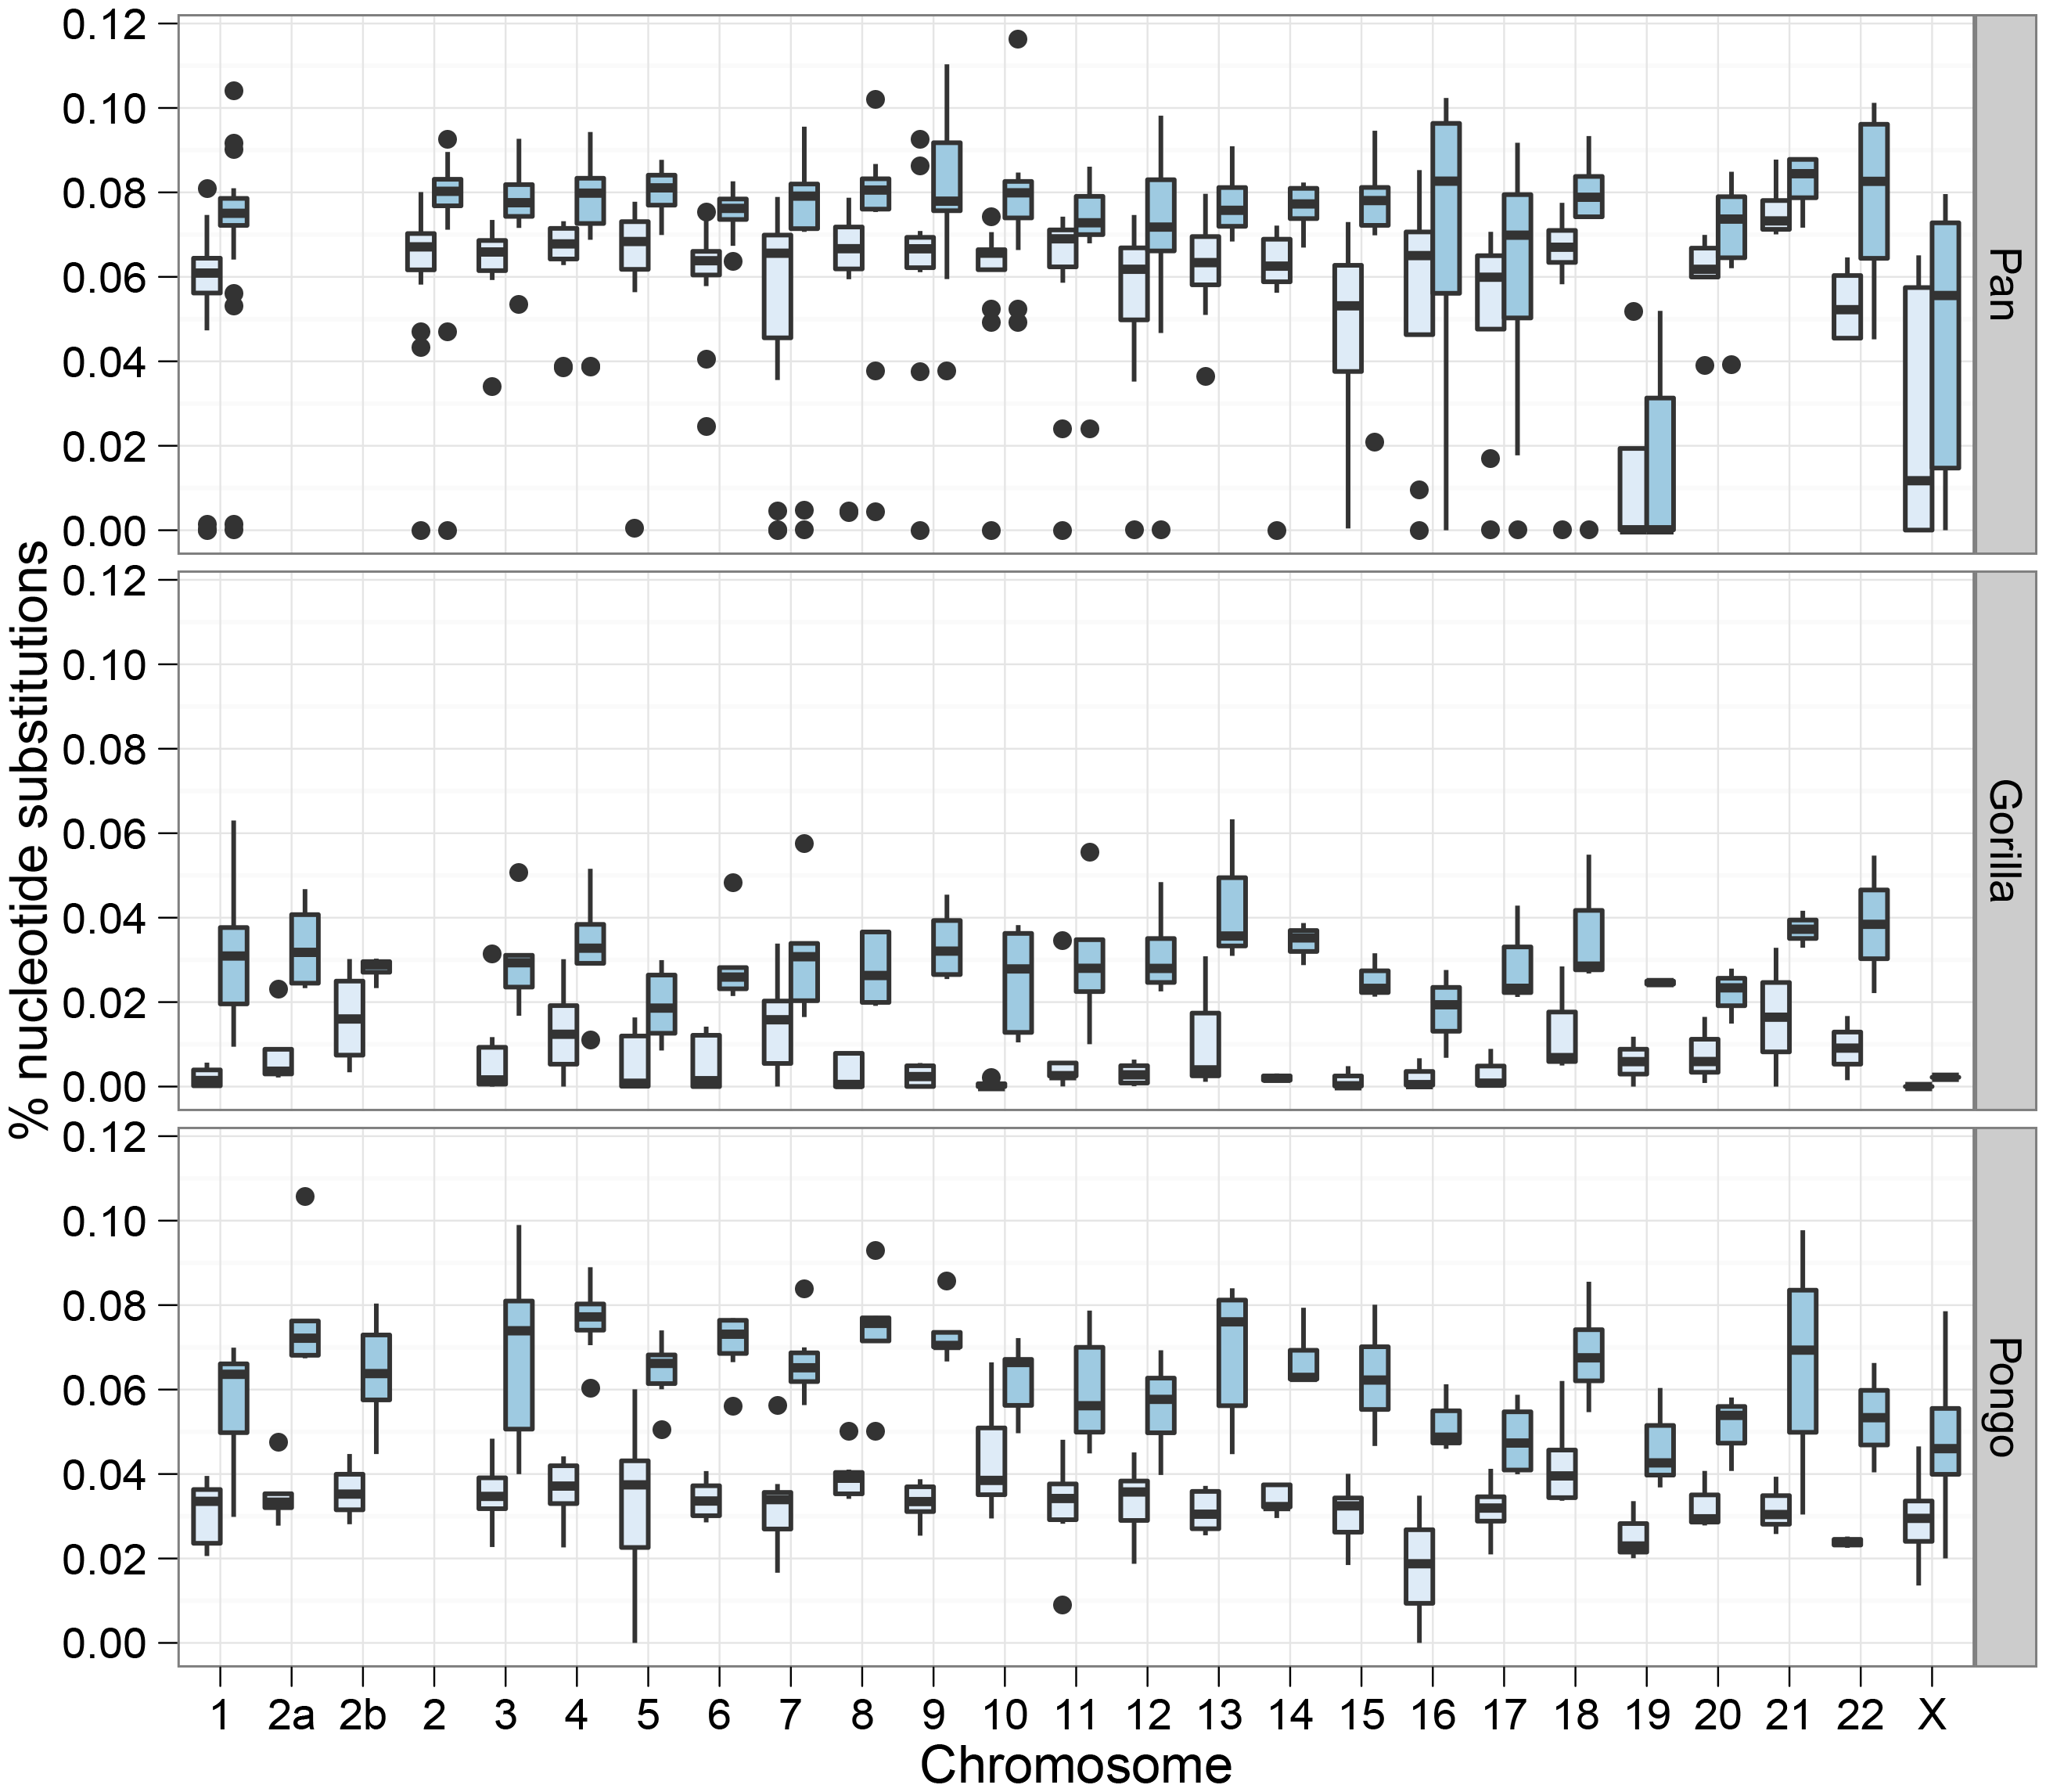 Chromosome wise split time estimates.